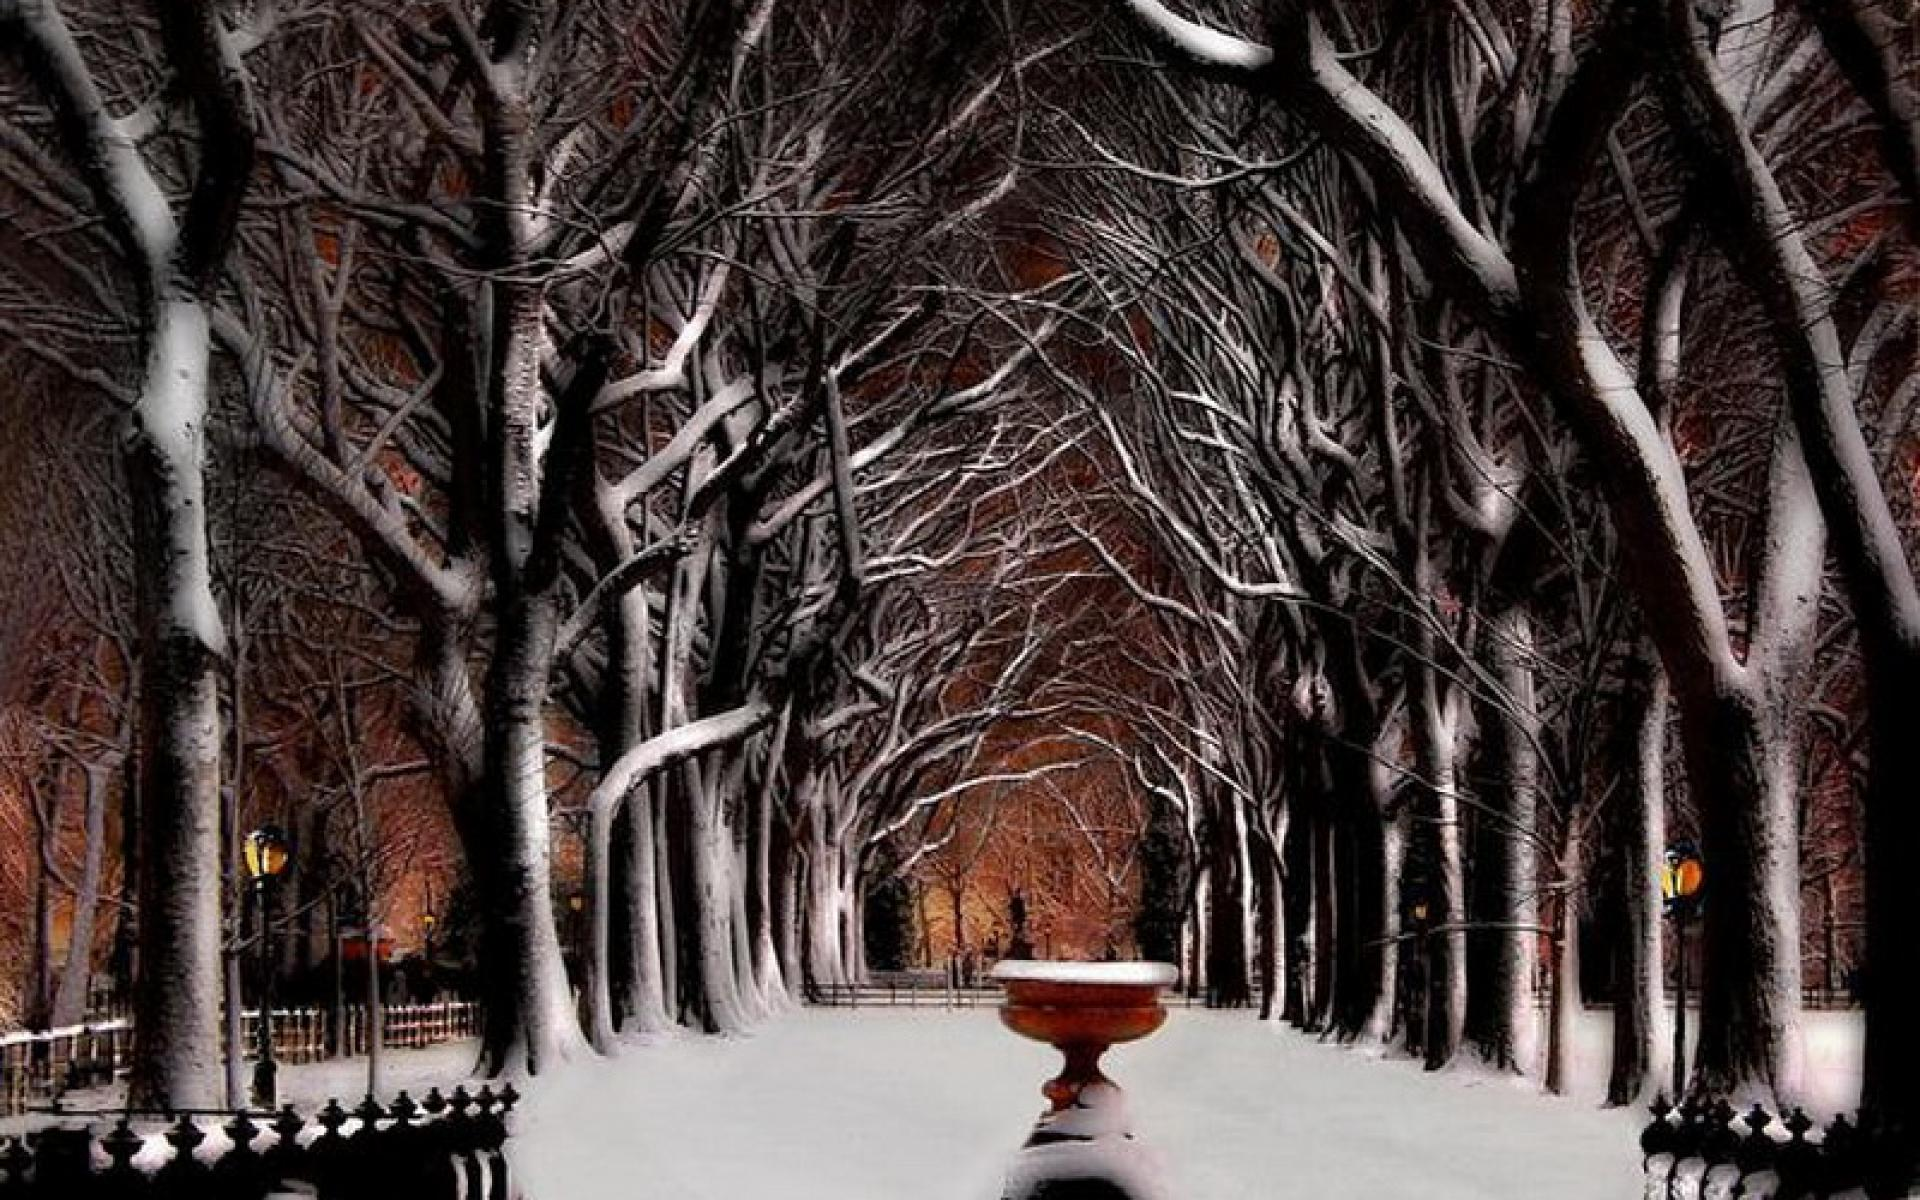 New York City Winter Wallpaper New York City Wallpaper Winter 1920x1200